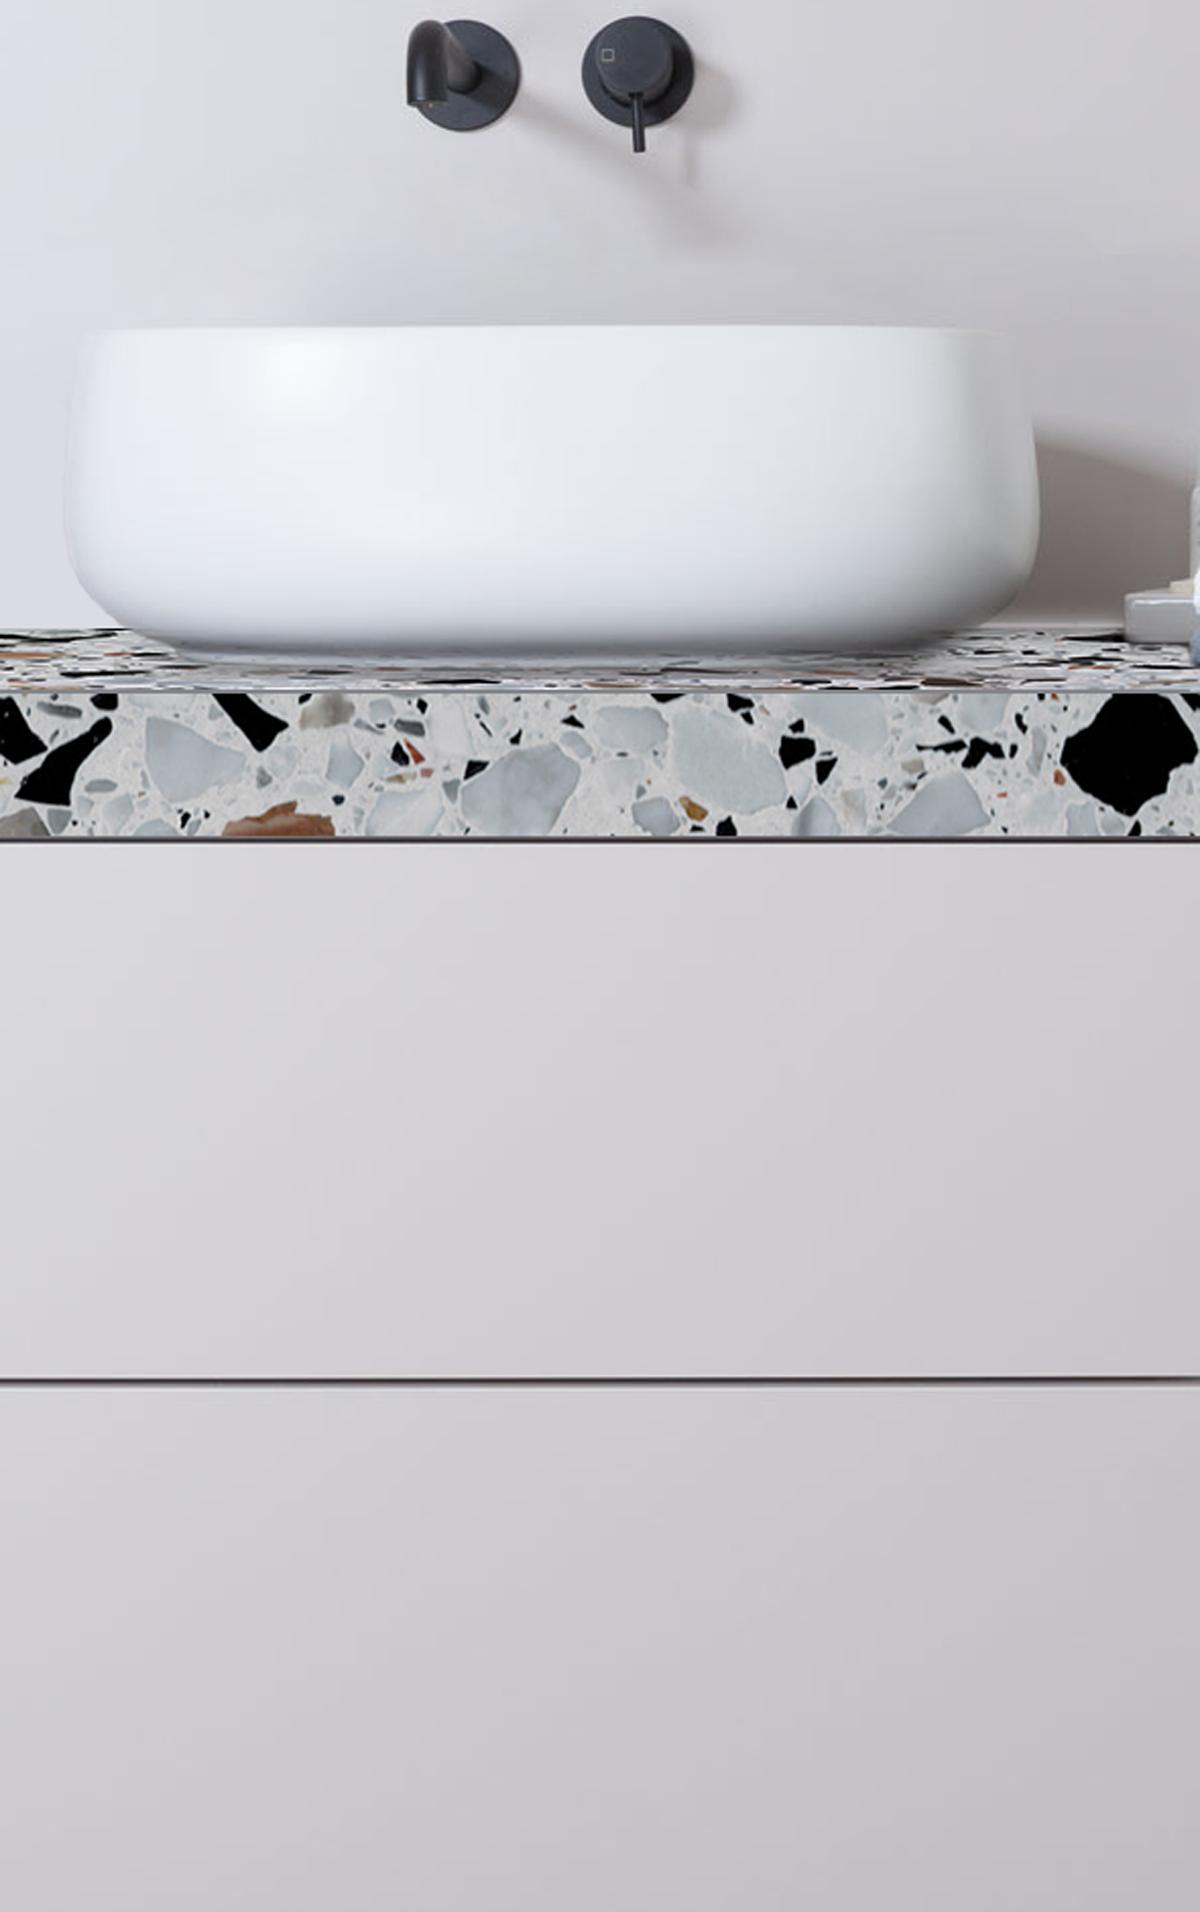 Salle De Bain Grise Blanche Et Noire ~ salle de bain meuble ne terrazzo gris bleu claire vasque poser